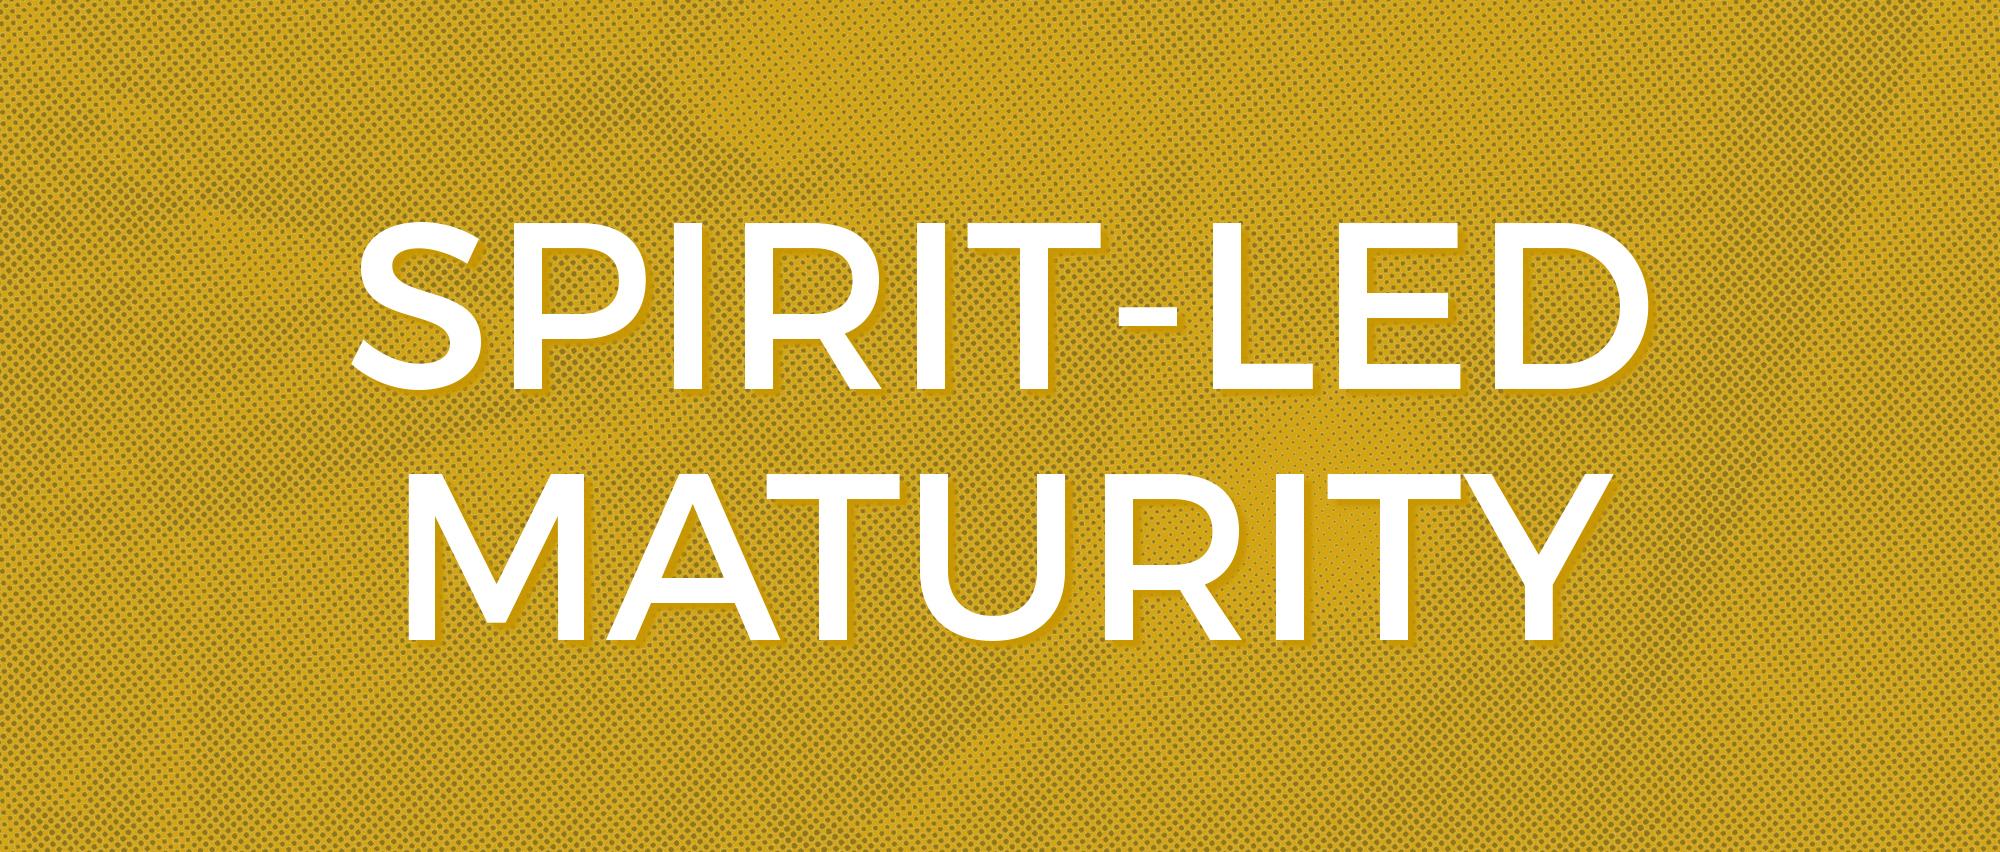 Spririt-Led Maturity.jpg